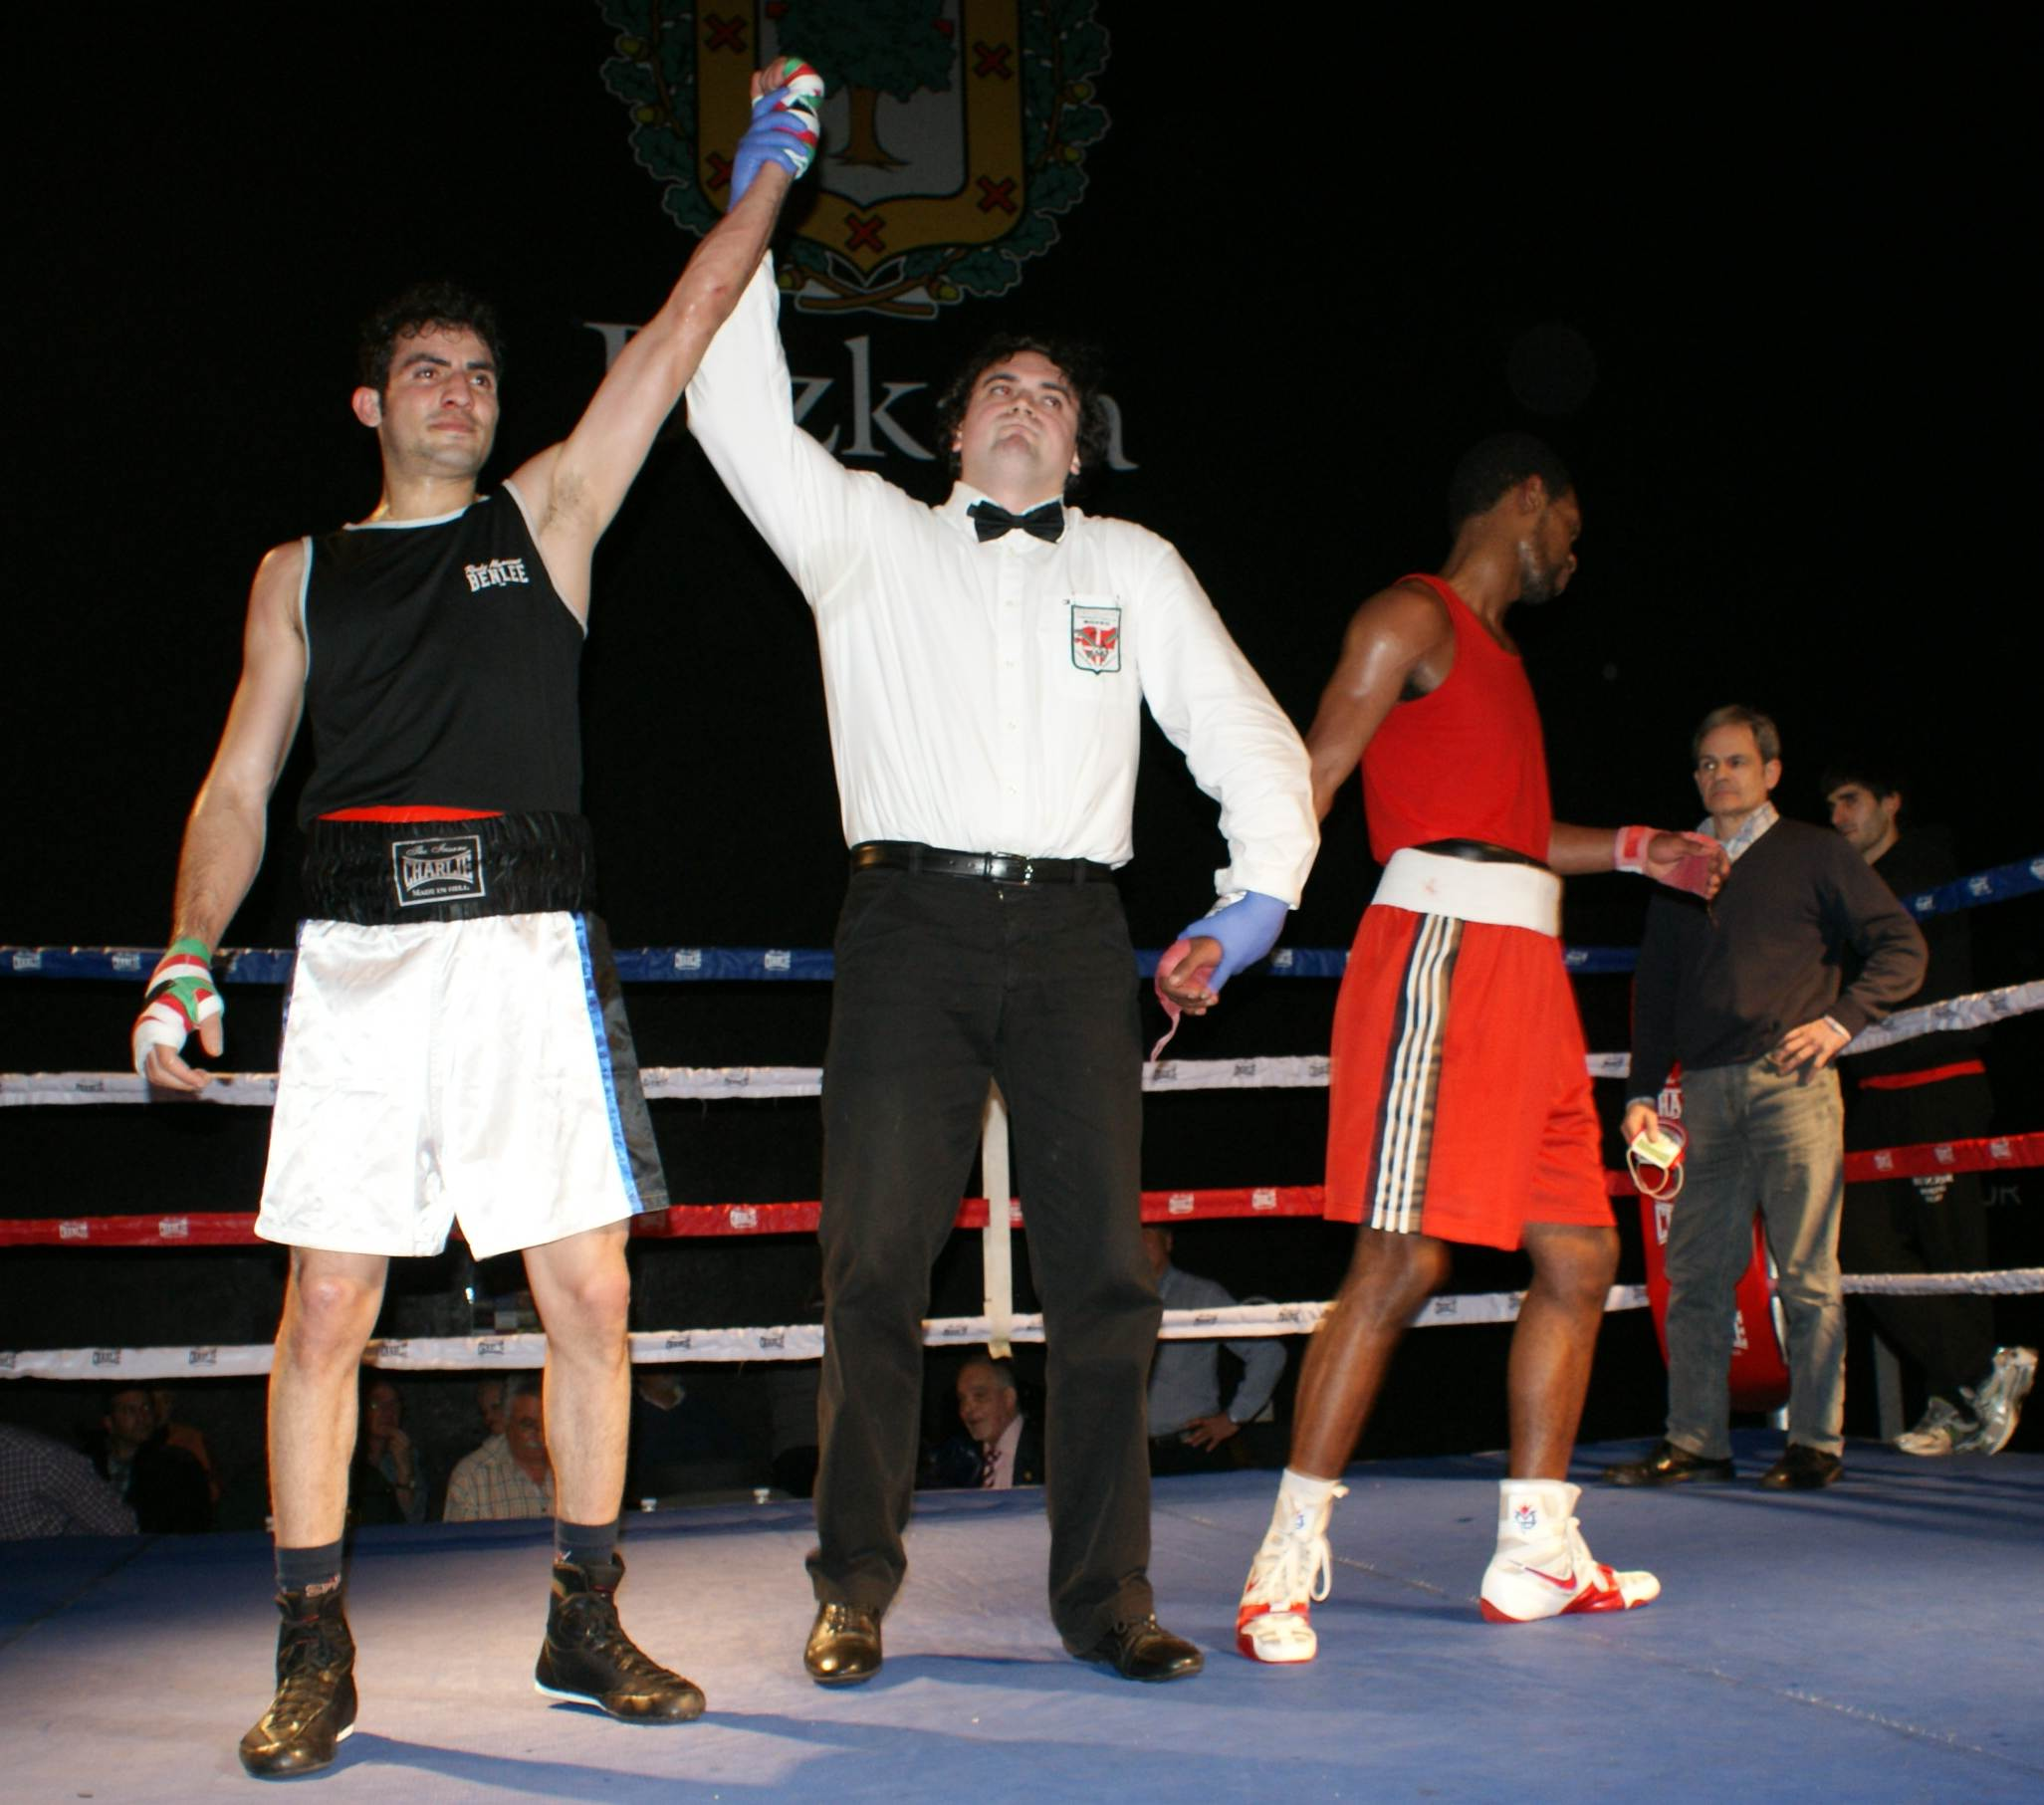 Boxeo, Bizkaia: Henry Siles y Ramón González